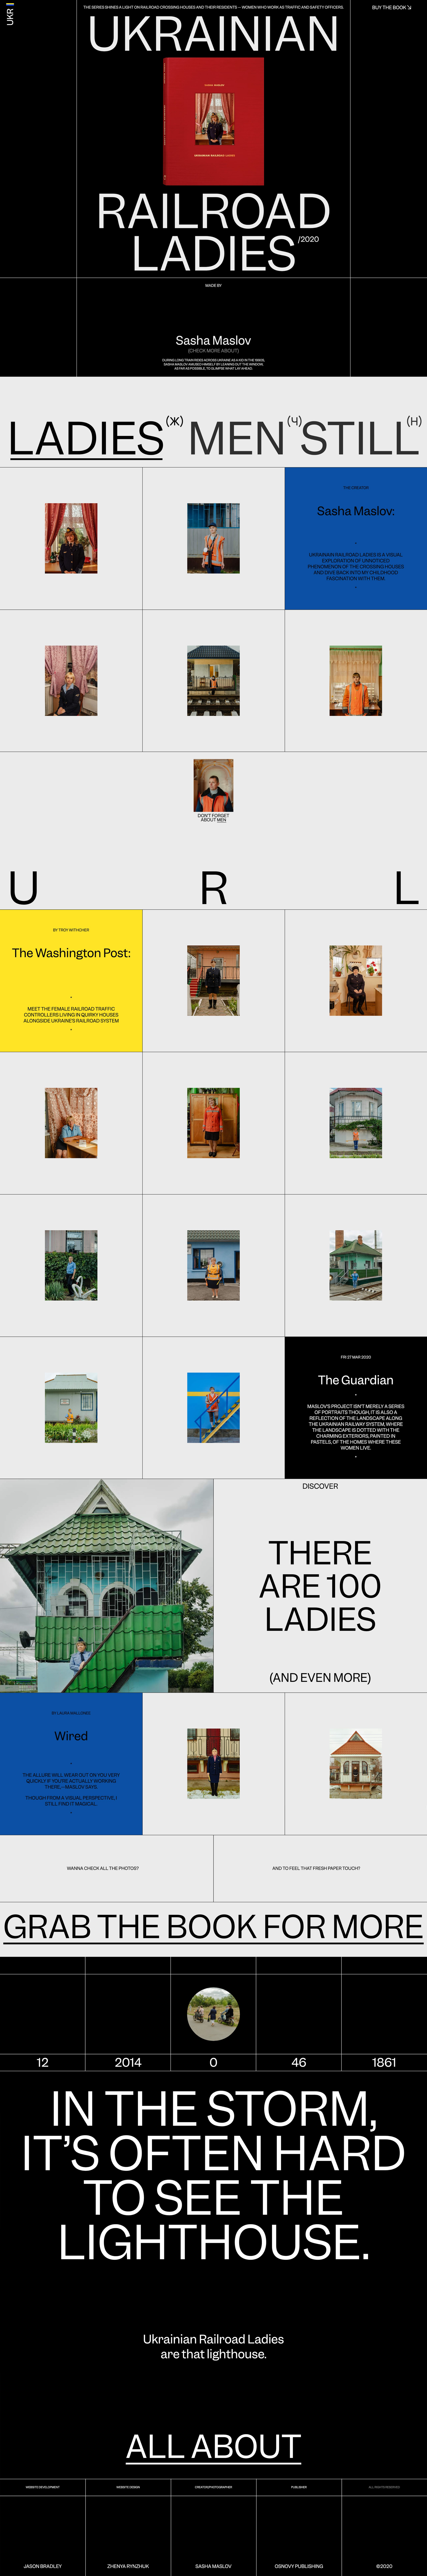 Ukrainian Railroad Ladies Website Screenshot